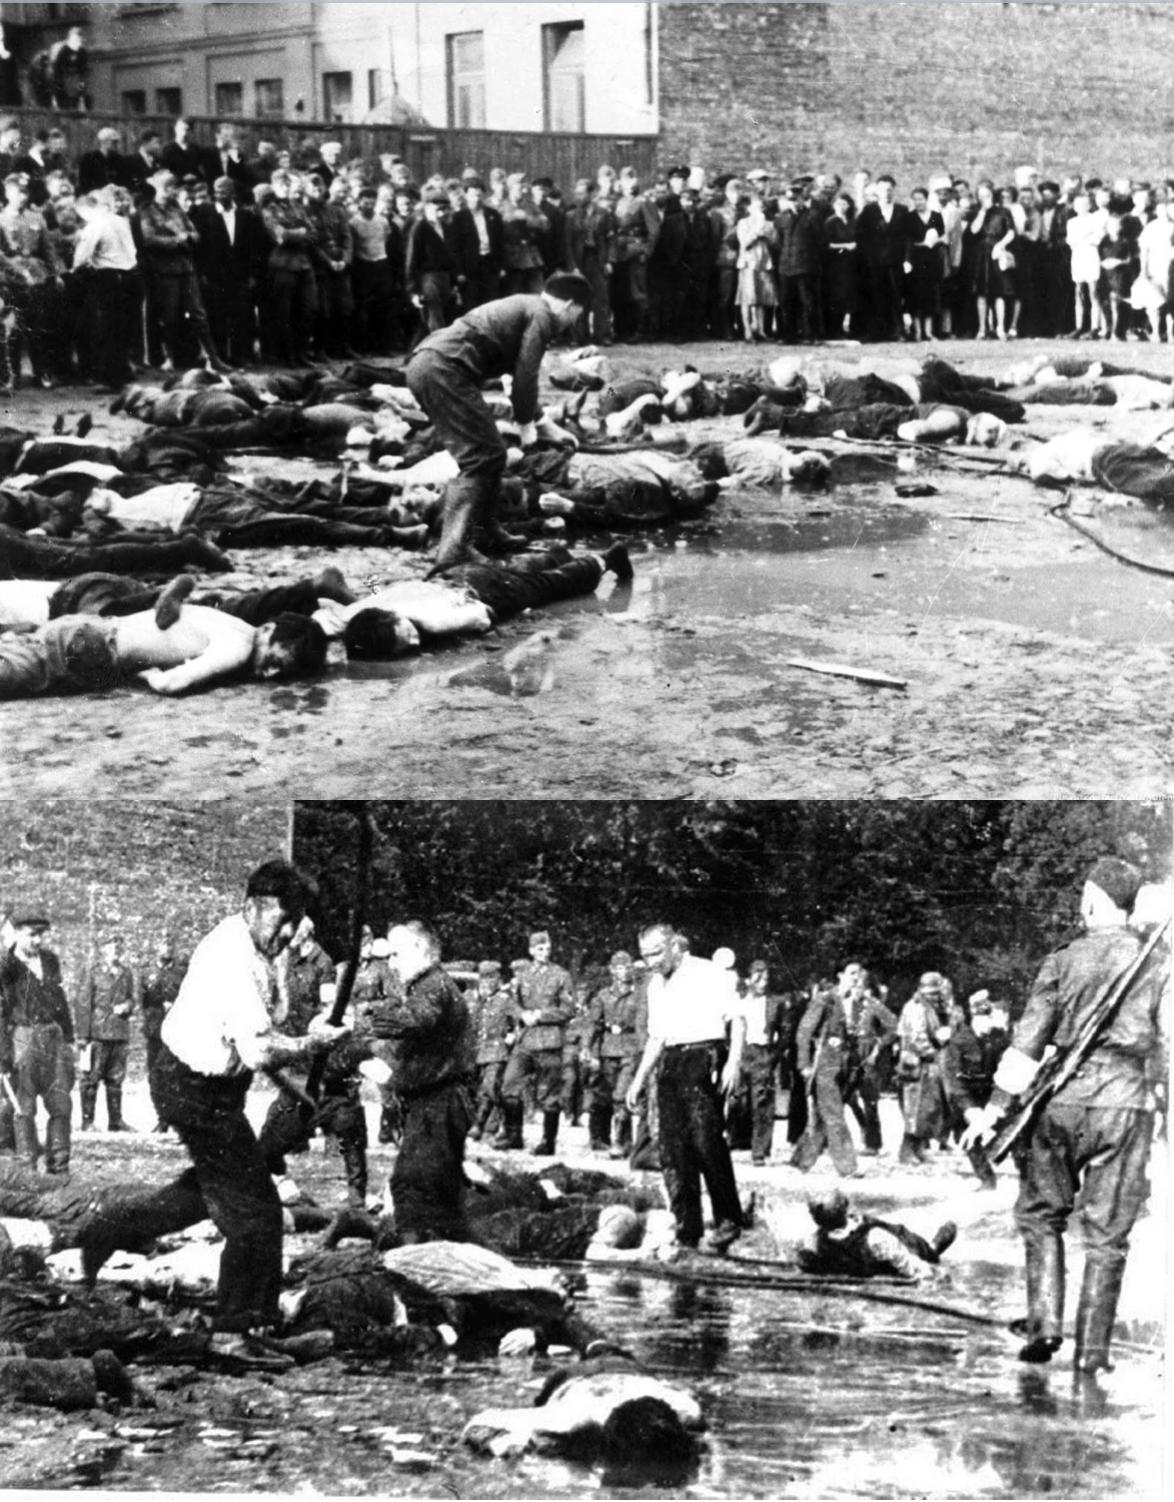 Matanza de judíos en Kaunas (Lituania) por la población civil.